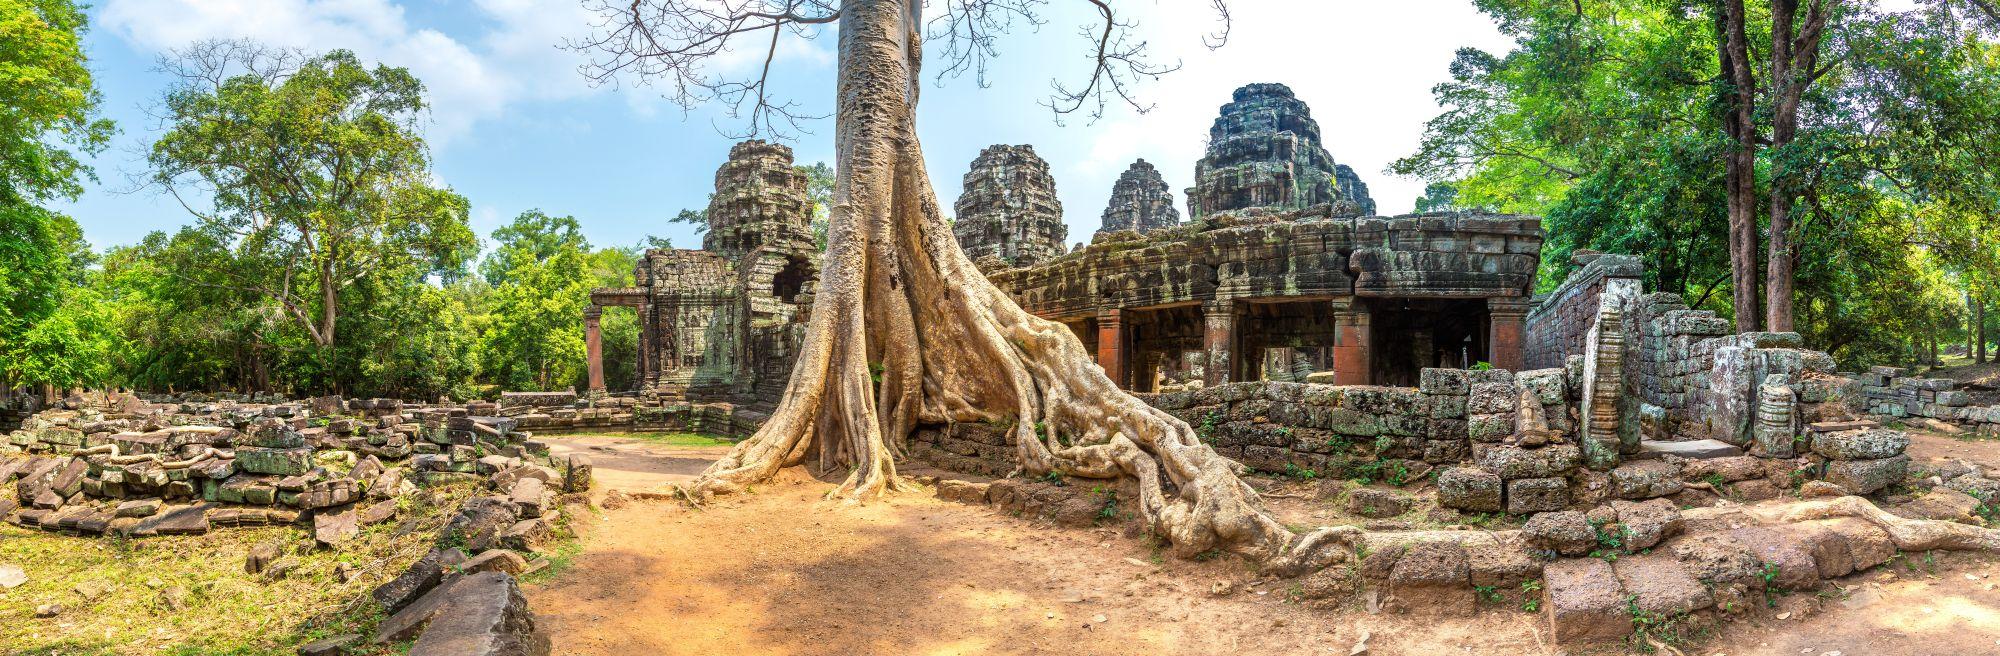 Cambodja Angkor Wat Banteay Kdei tempel